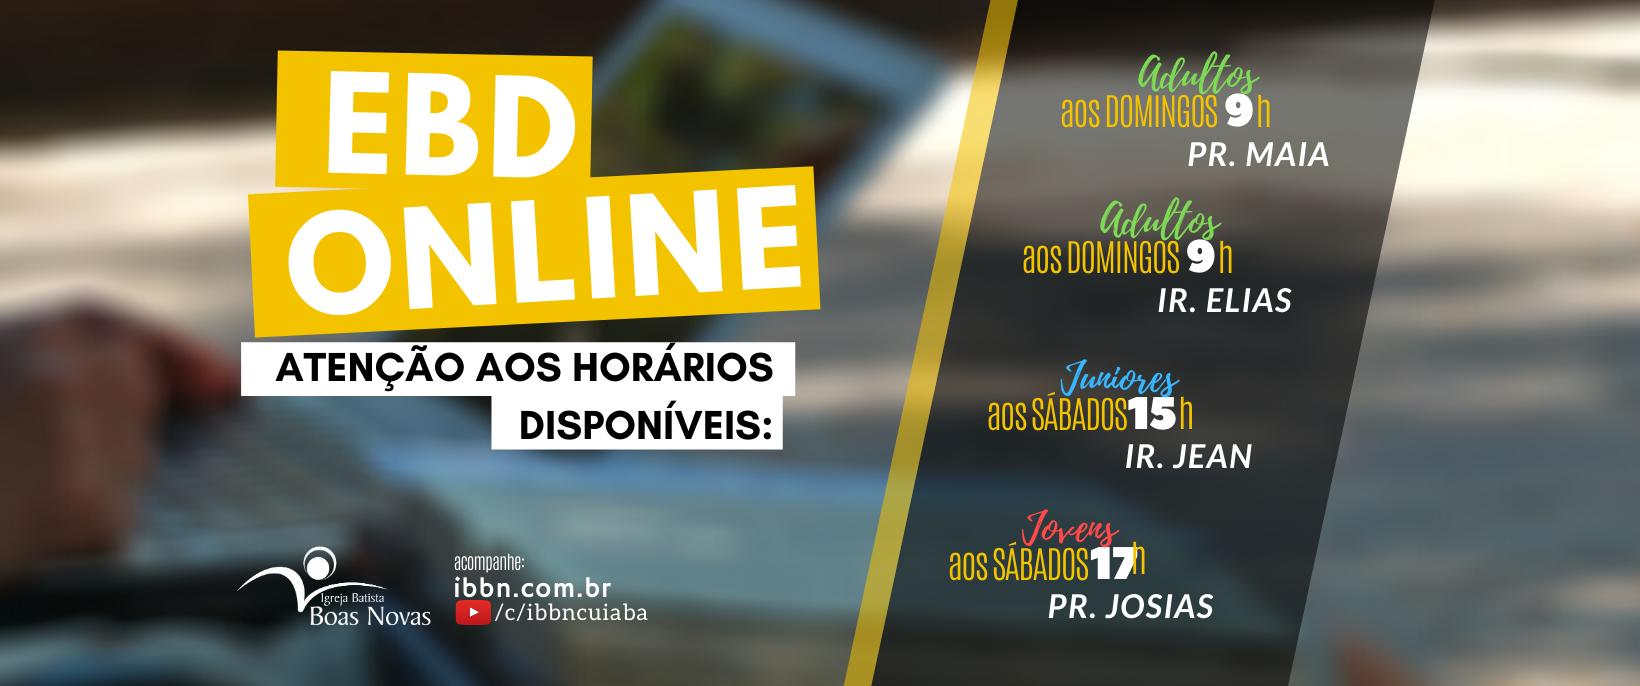 EBD Online